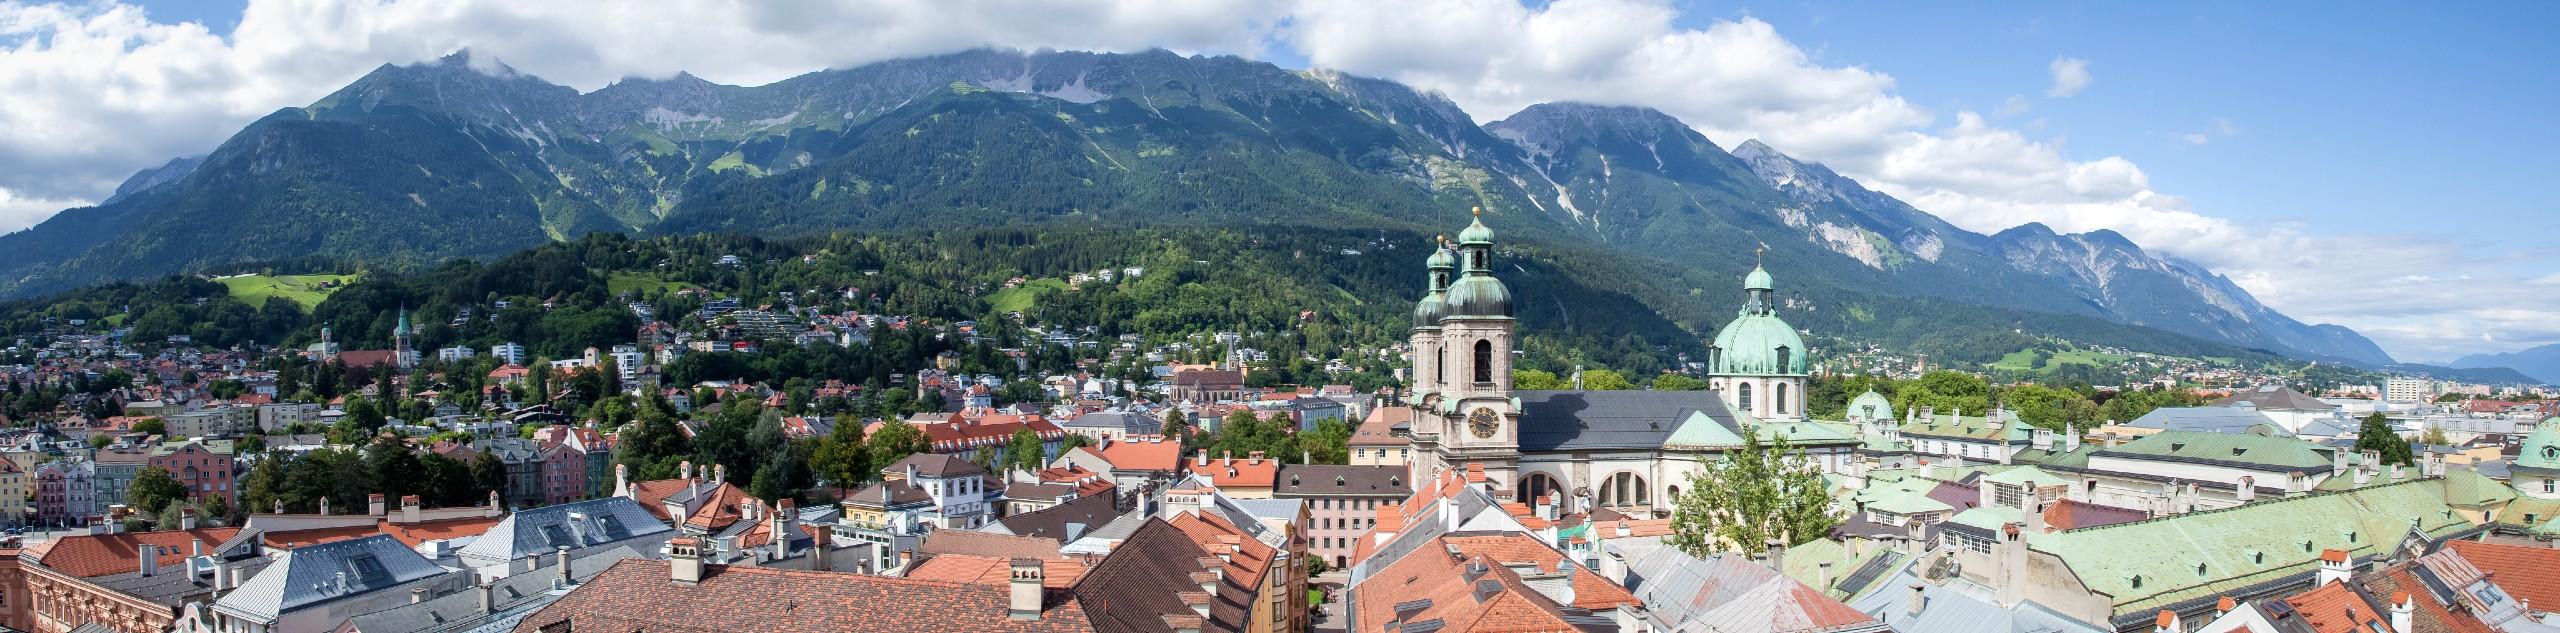 Innsbruck to Venice Bike Tour